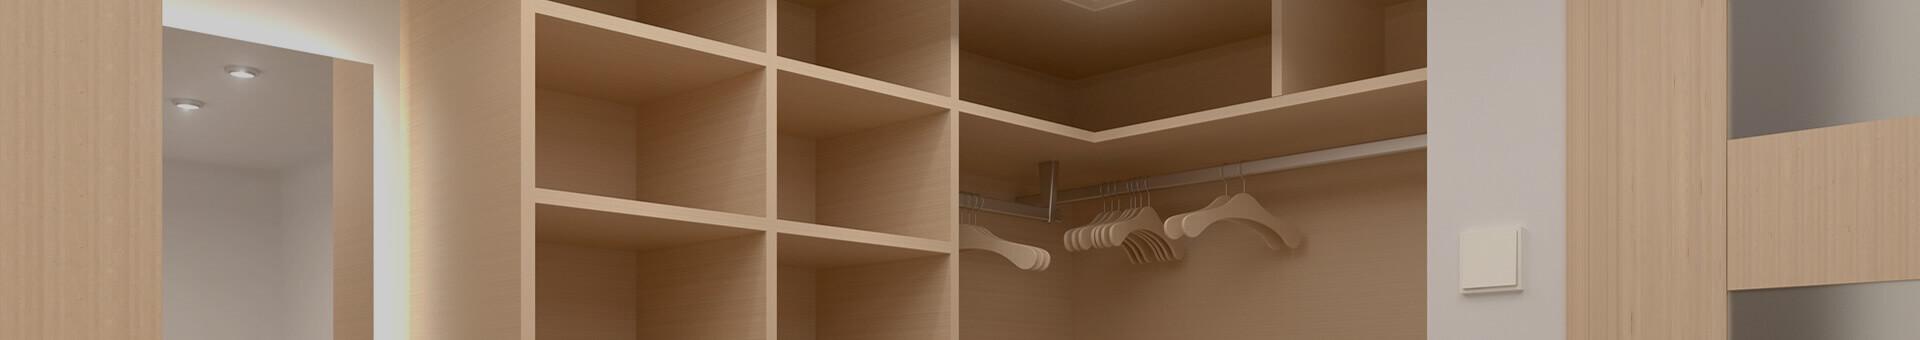 anleitung wandschrank selber bauen schrittweise erkl rt. Black Bedroom Furniture Sets. Home Design Ideas